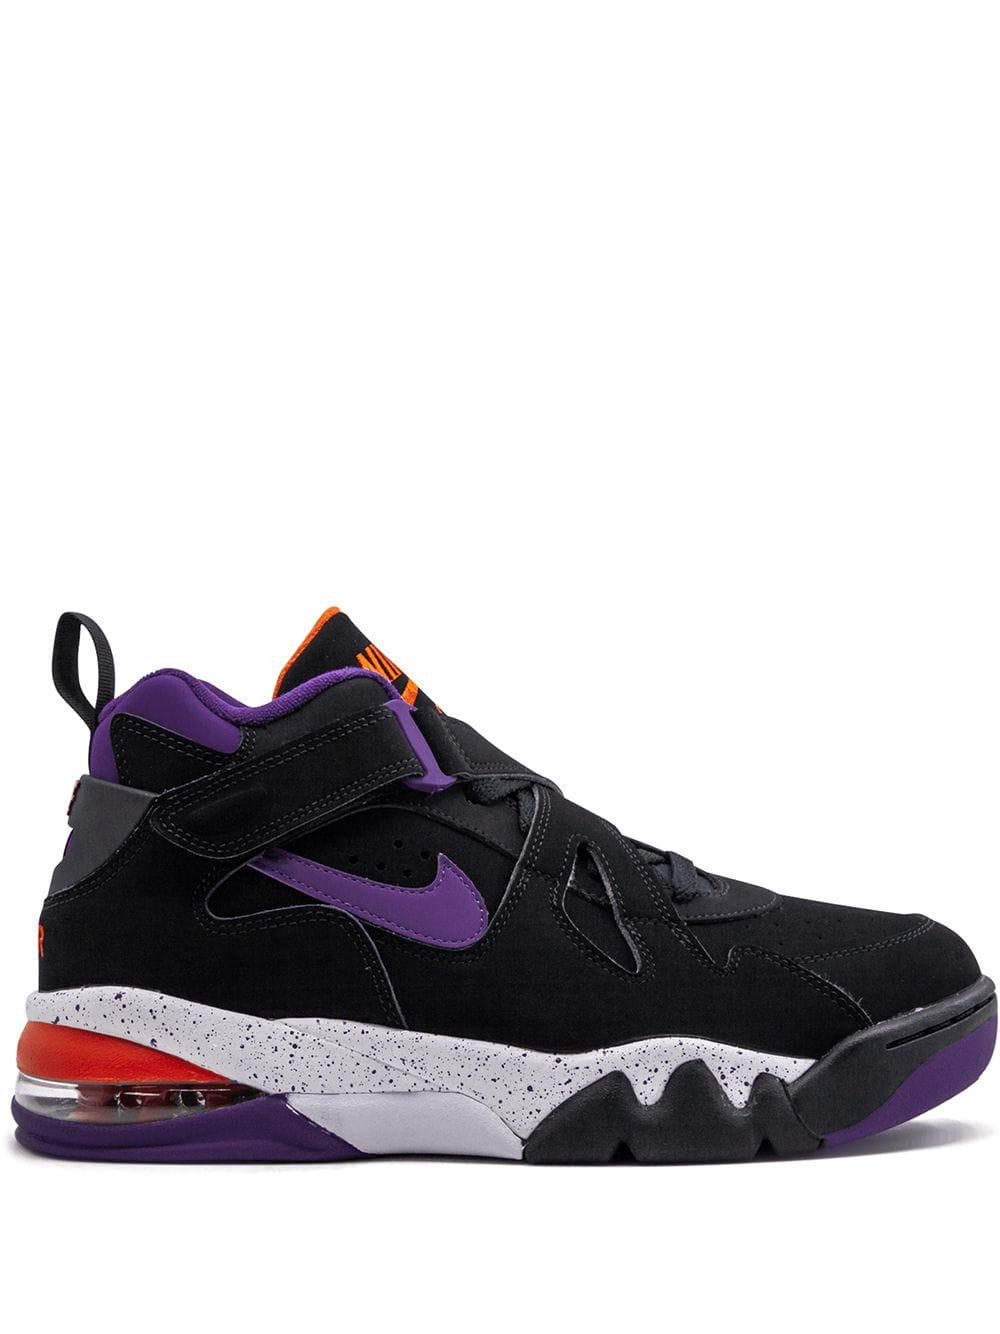 6e1c176950a9fc Nike Air Force Max Cb Sneakers - Farfetch In Black